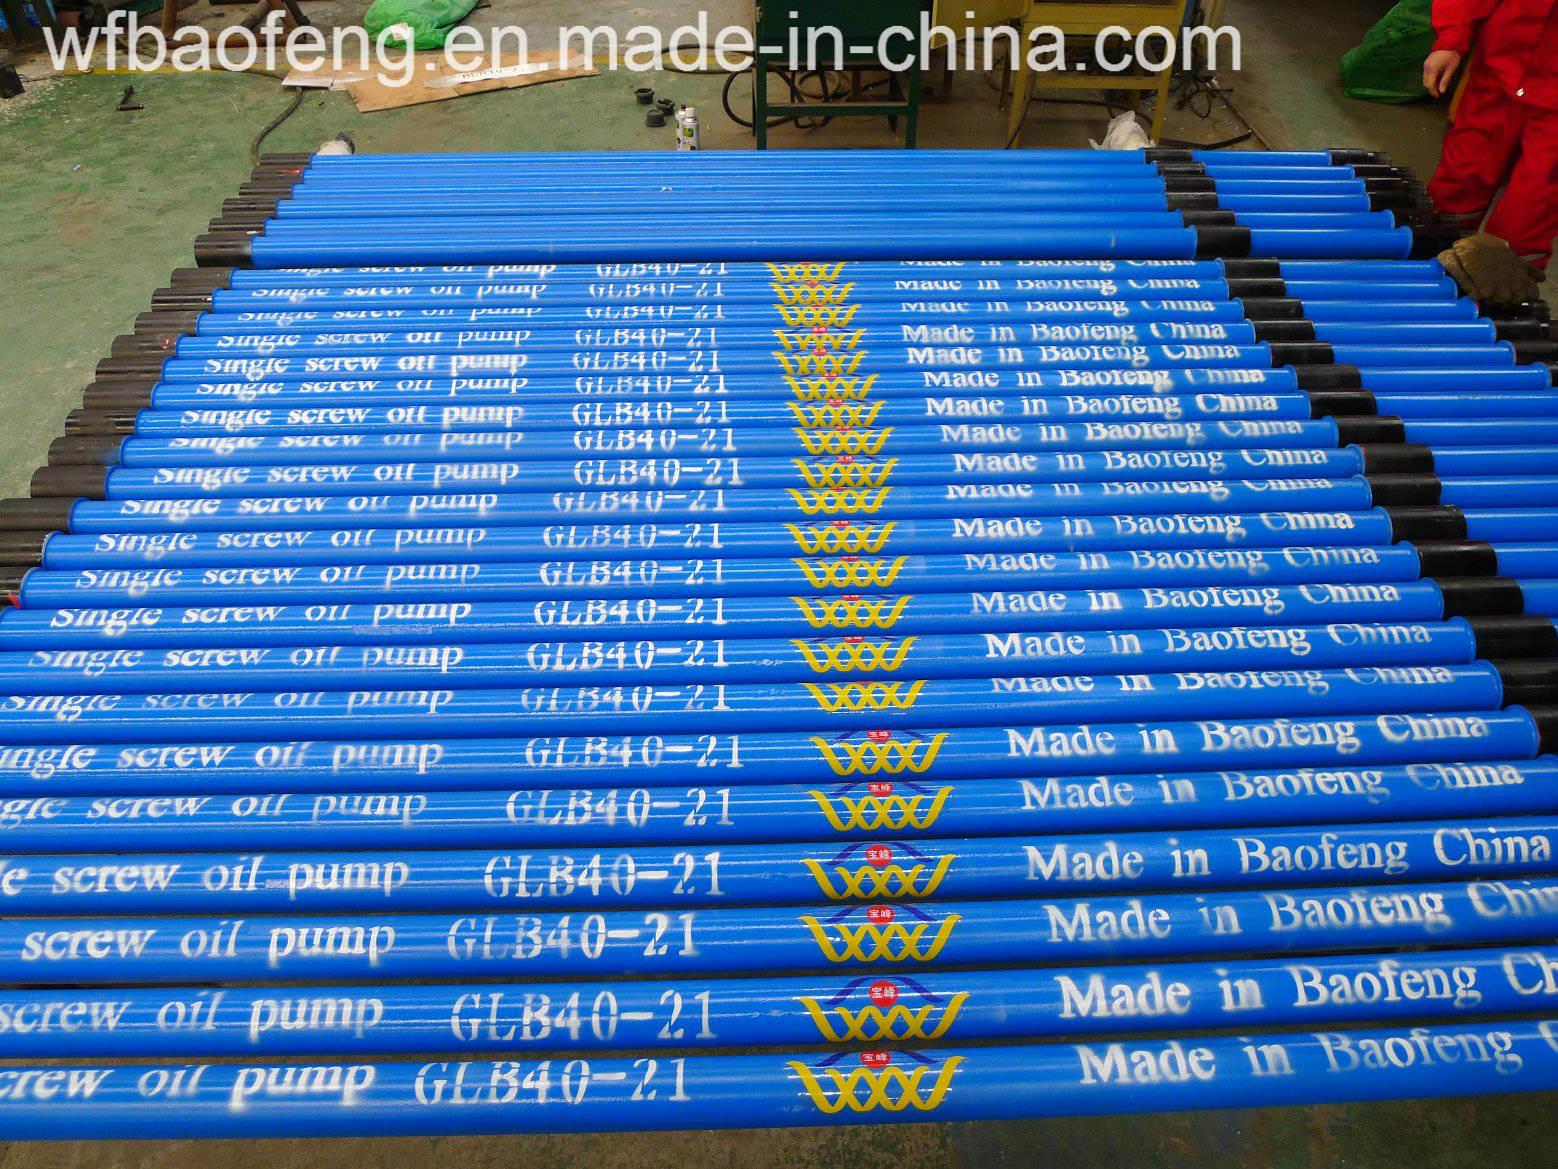 Oilfield Pcp Screw Pump PC Pump Well Pump for Sale